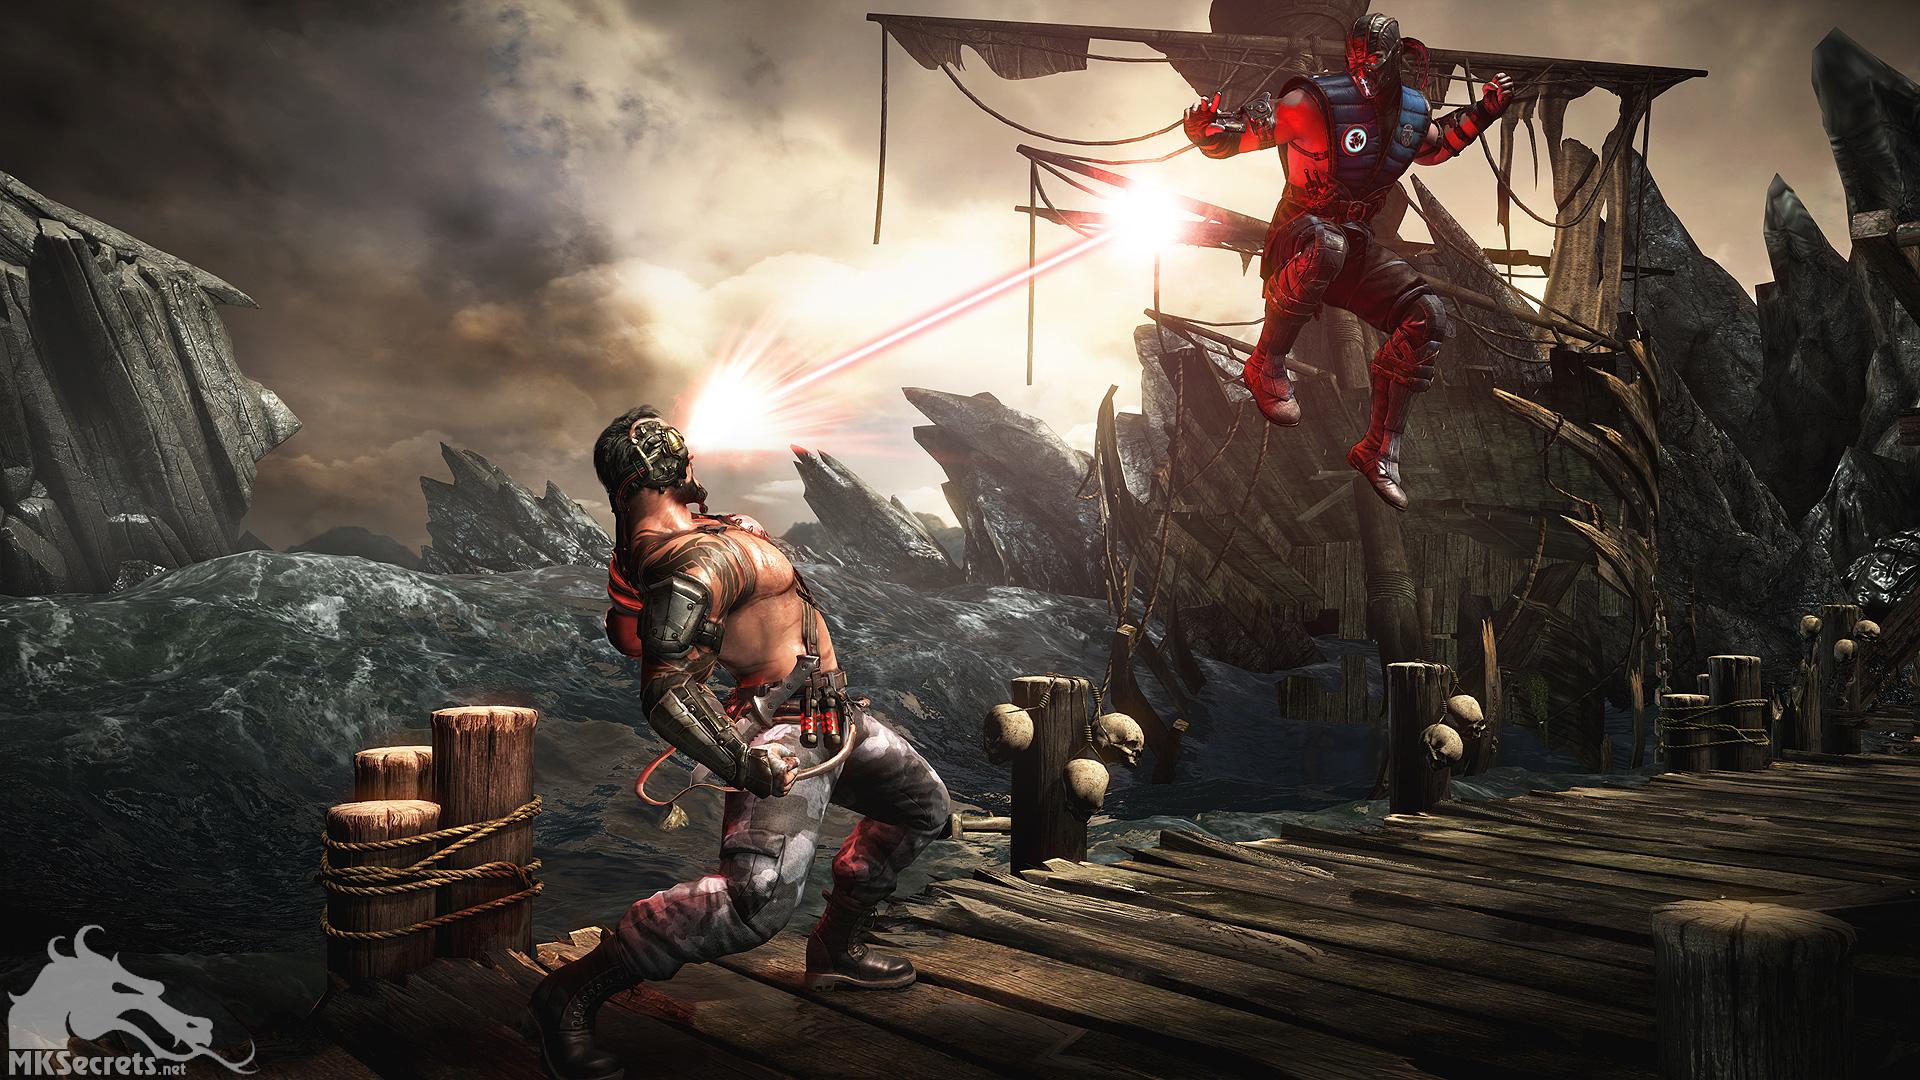 Mortal Kombat X Screenshots - Mortal Kombat Secrets